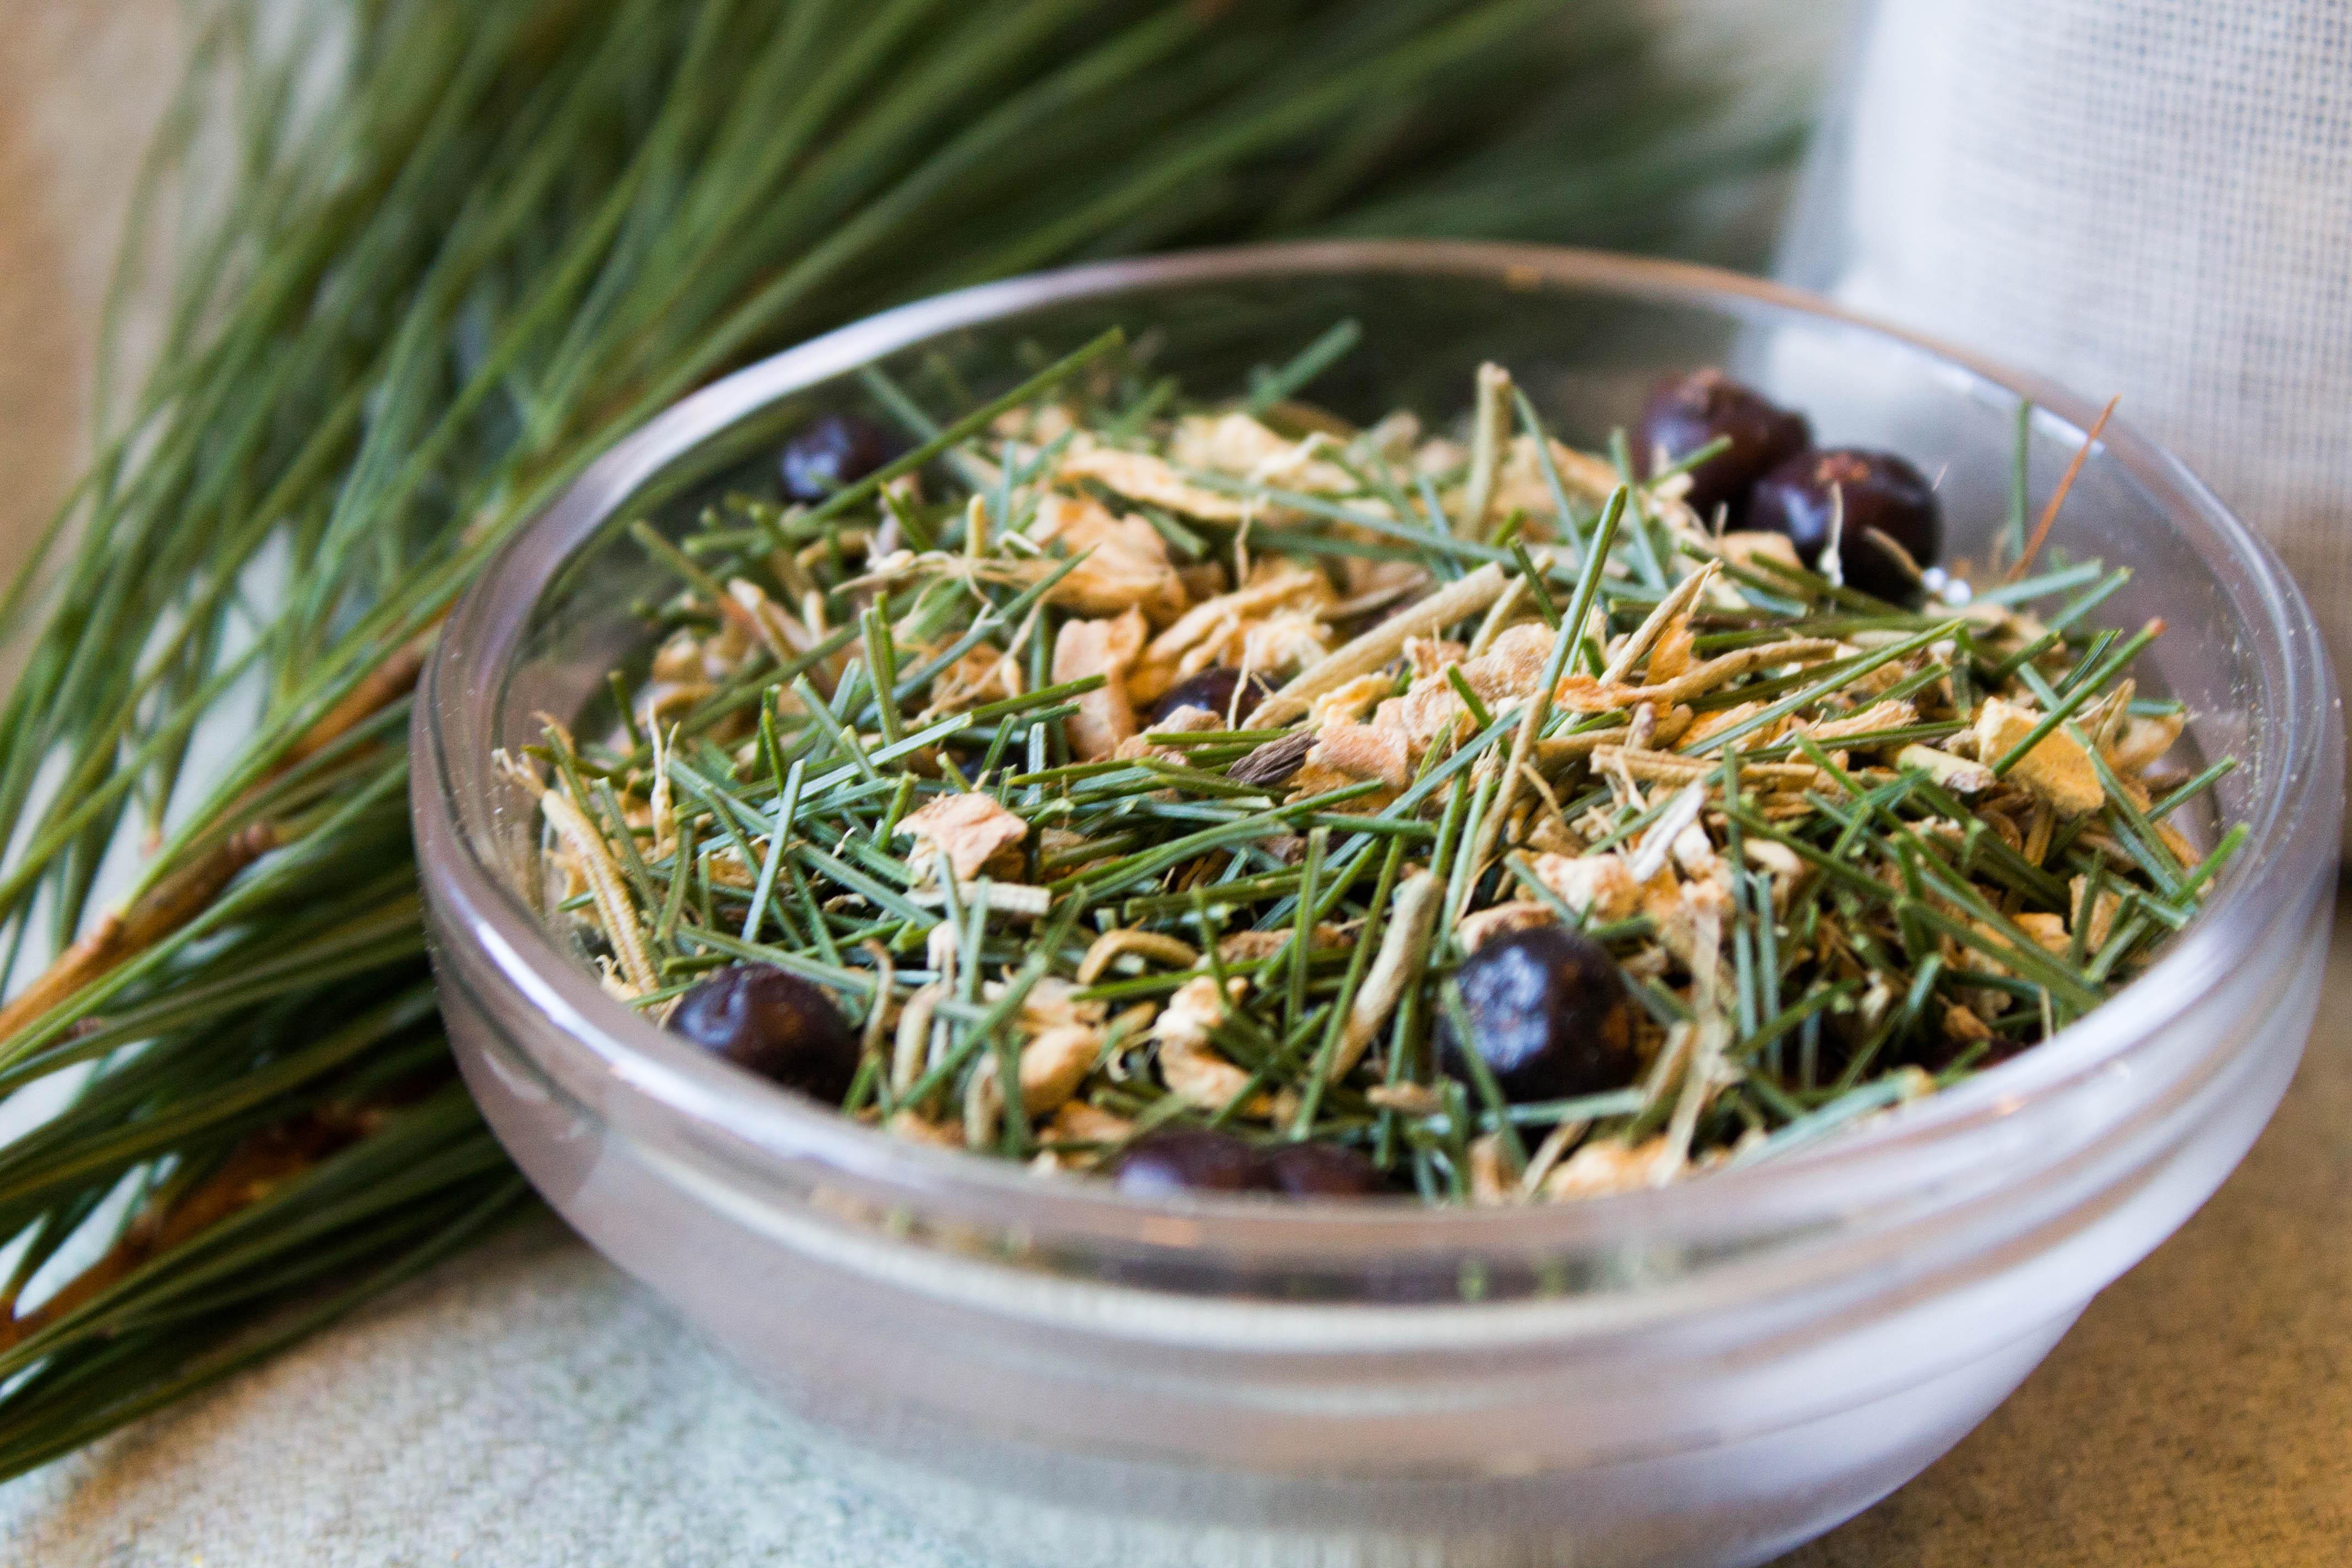 Evergreen ginger bath tonic herb shop for Evergreen shop